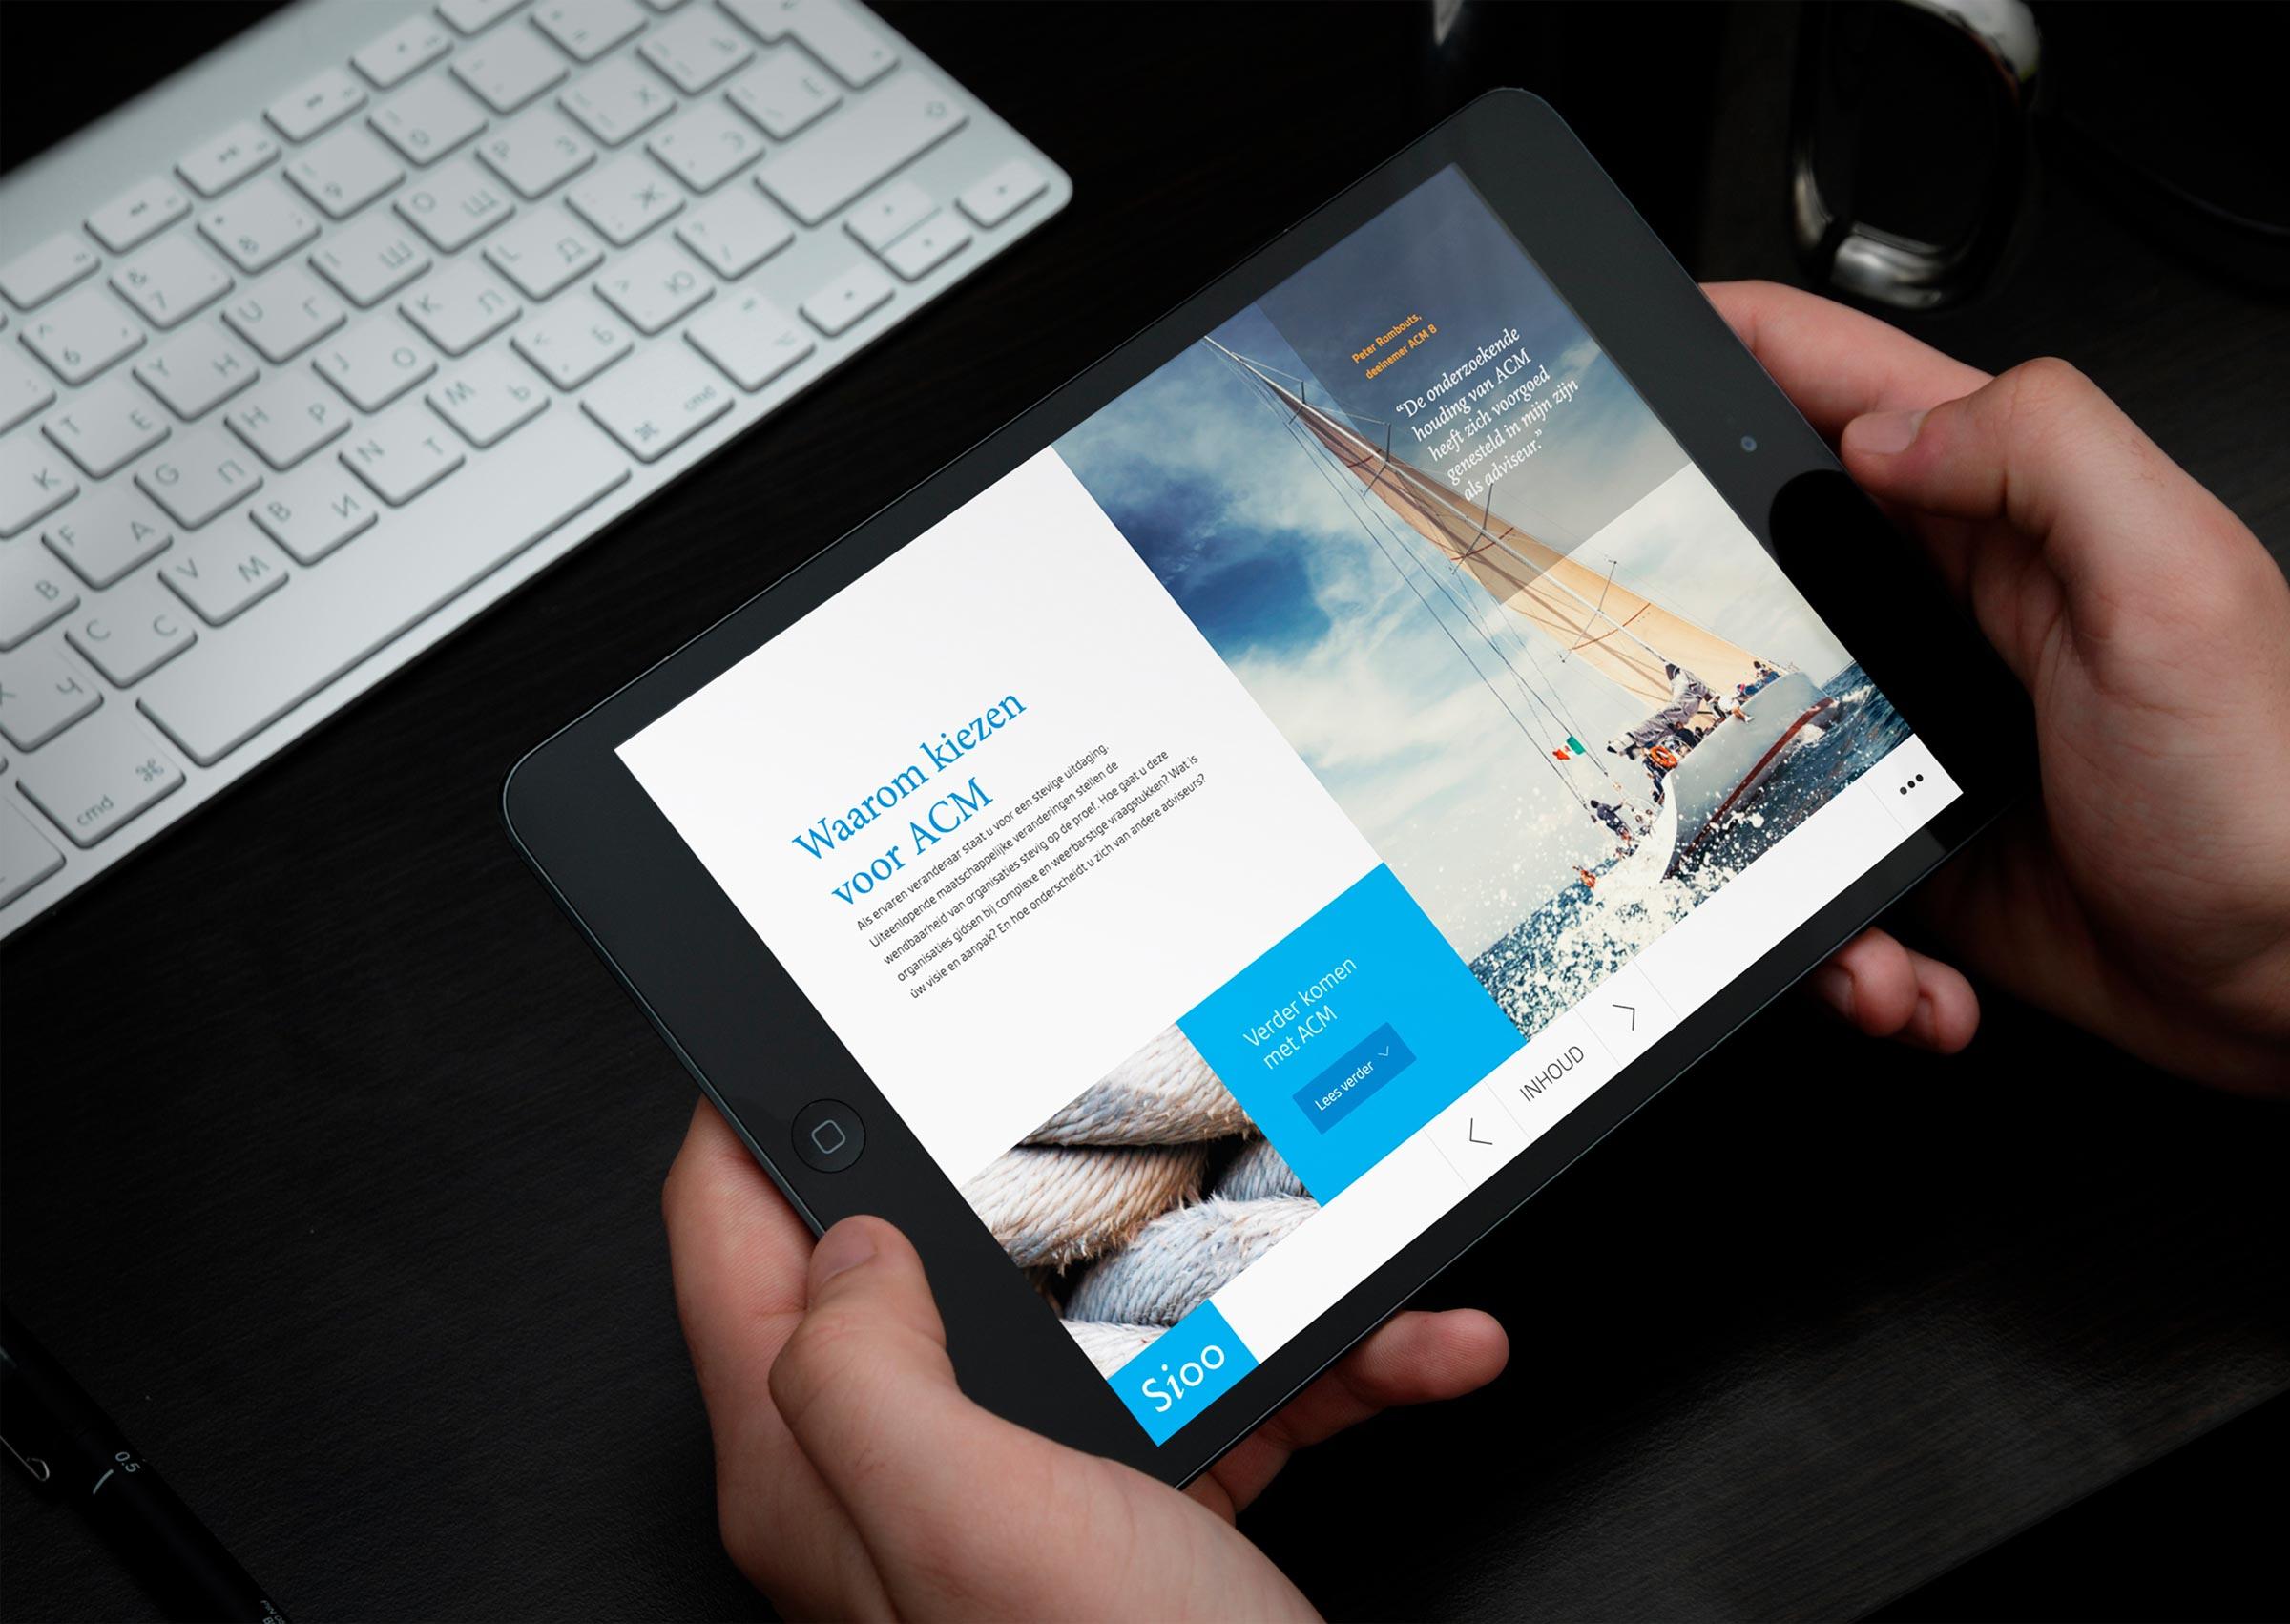 onlinemagazine_dutchgiraffe_sioo_device